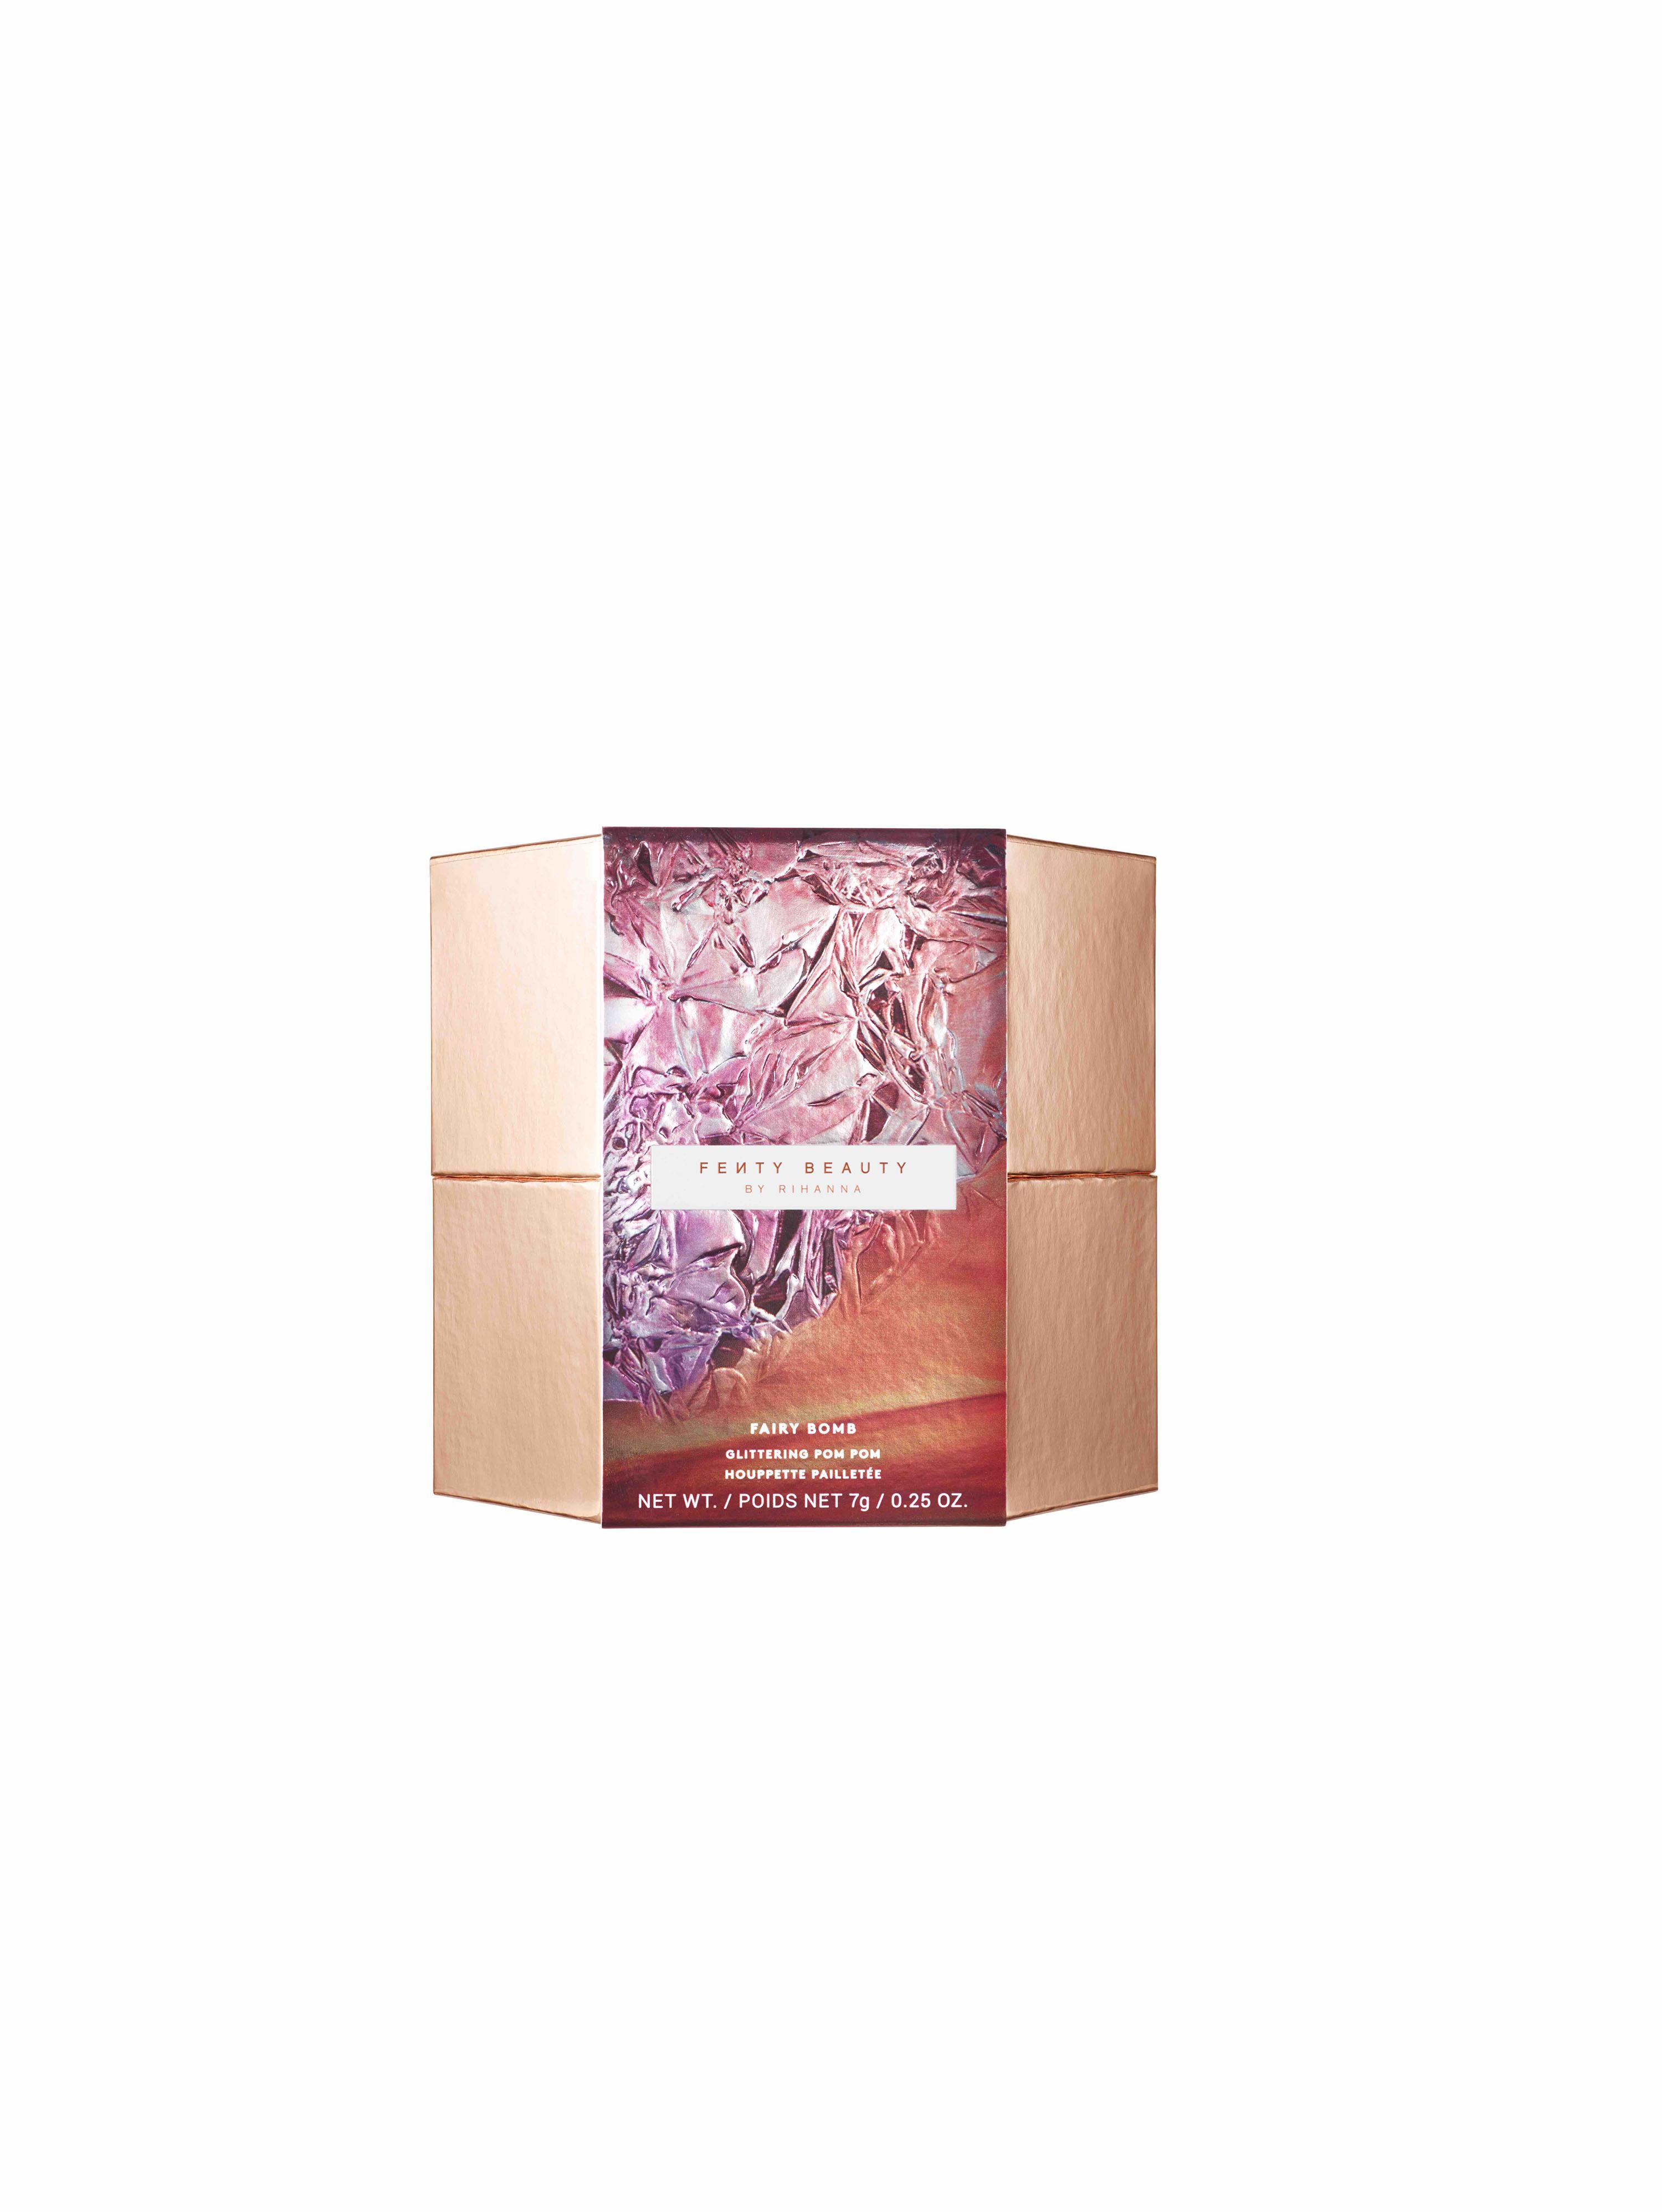 Fairy Bomb Glittering Pom Pom Packaging - AED 210